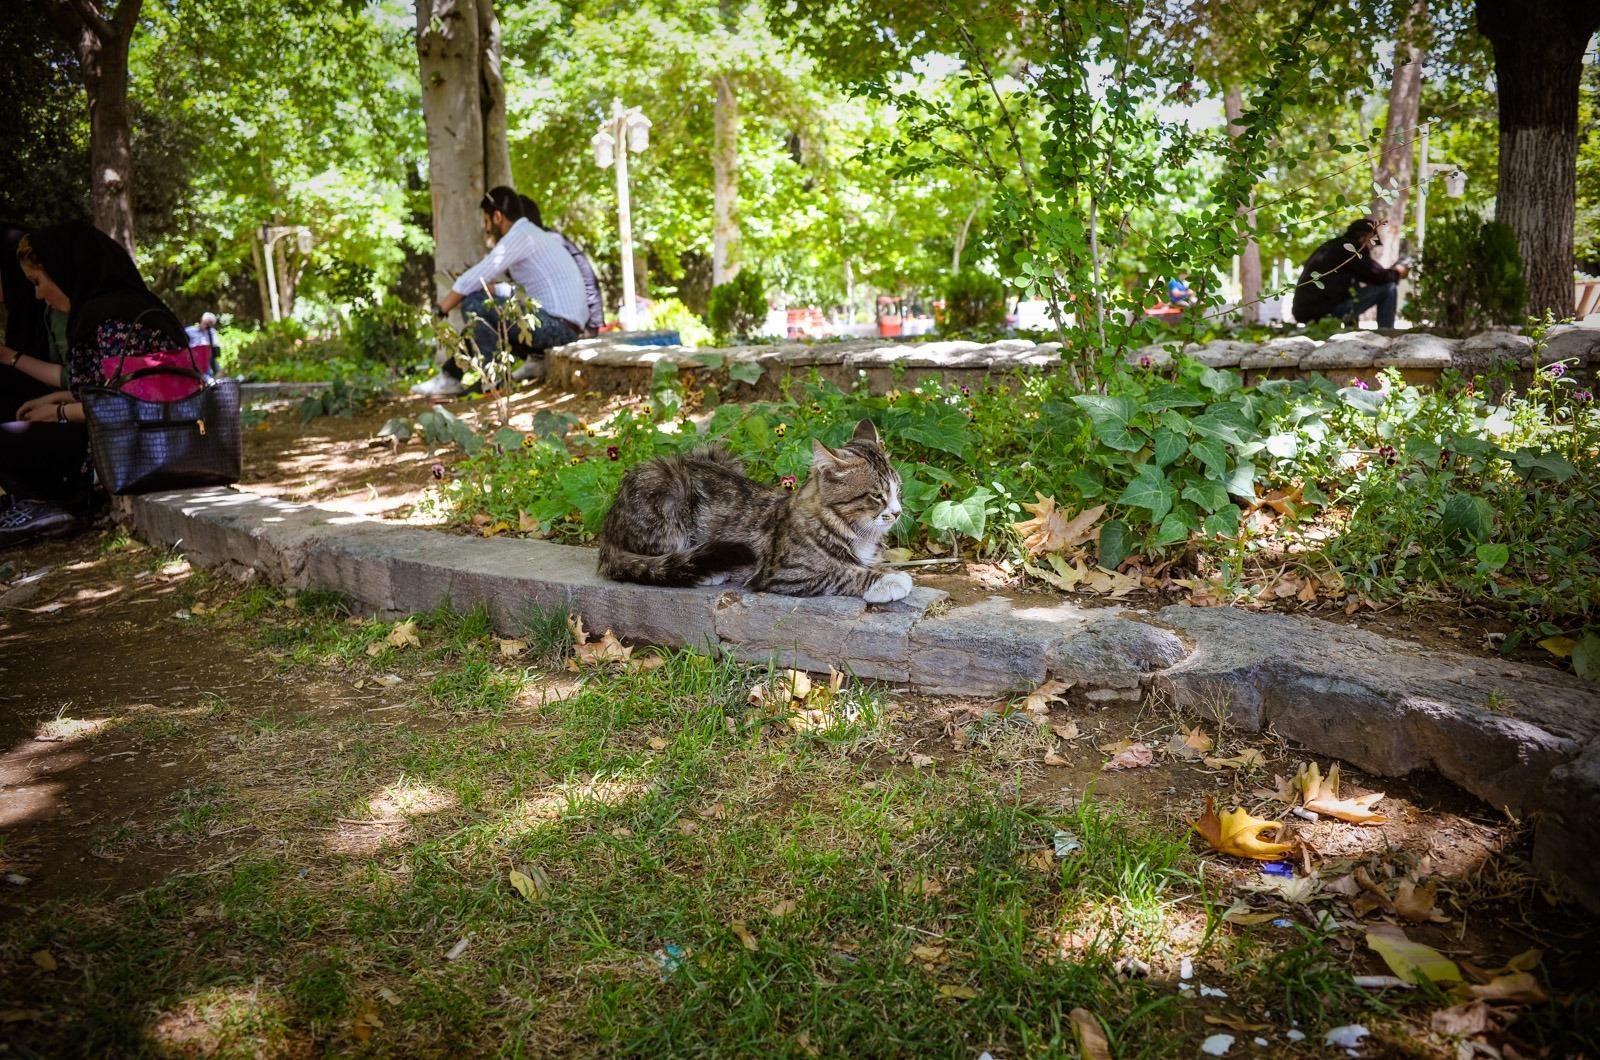 Essen im Park trotz Ramadan - Iran -Teheran